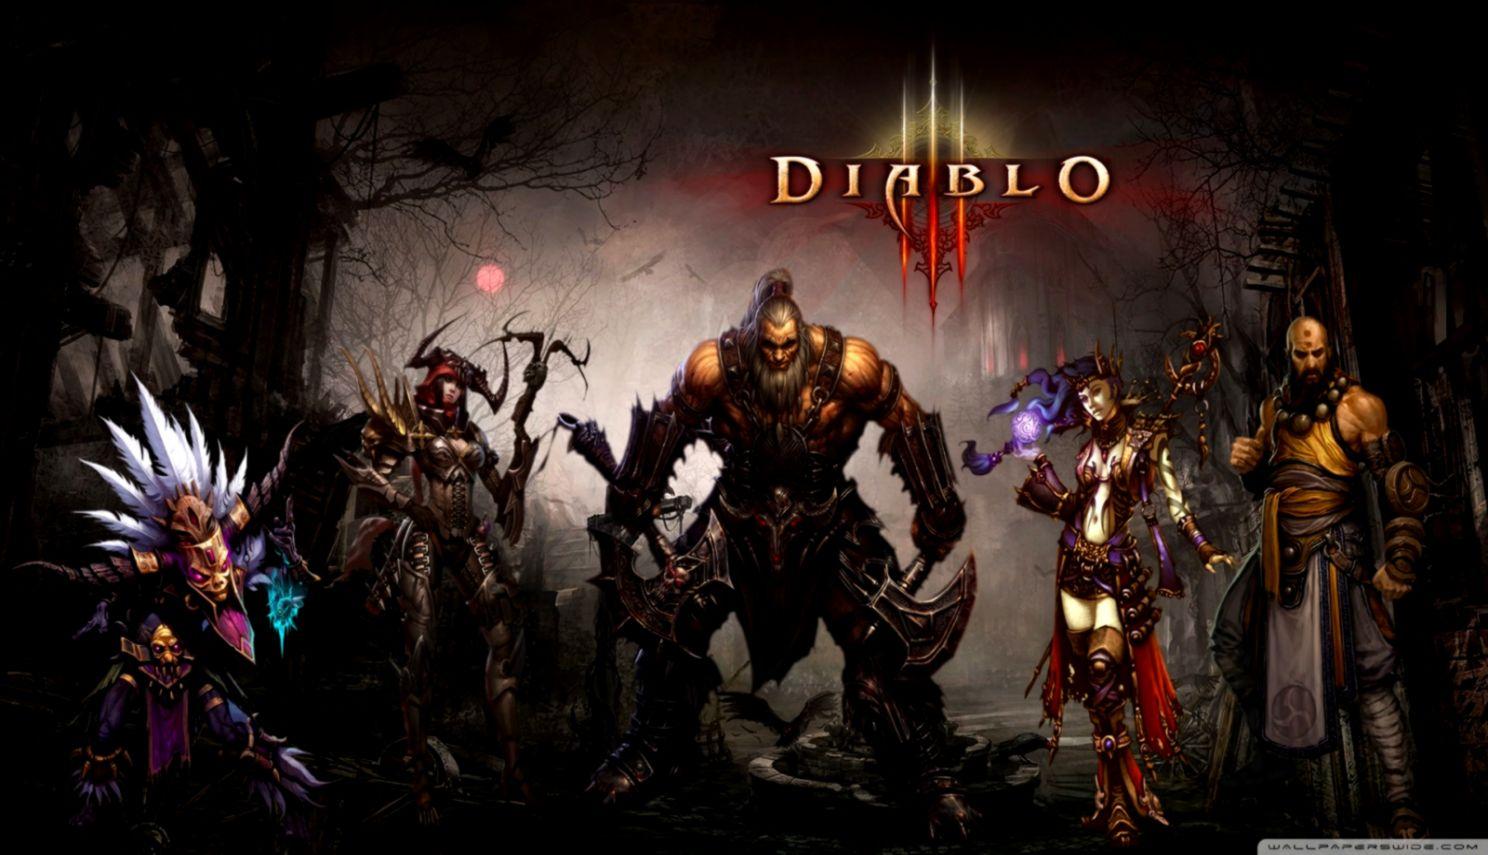 Download Diablo 3 Wallpaper Android